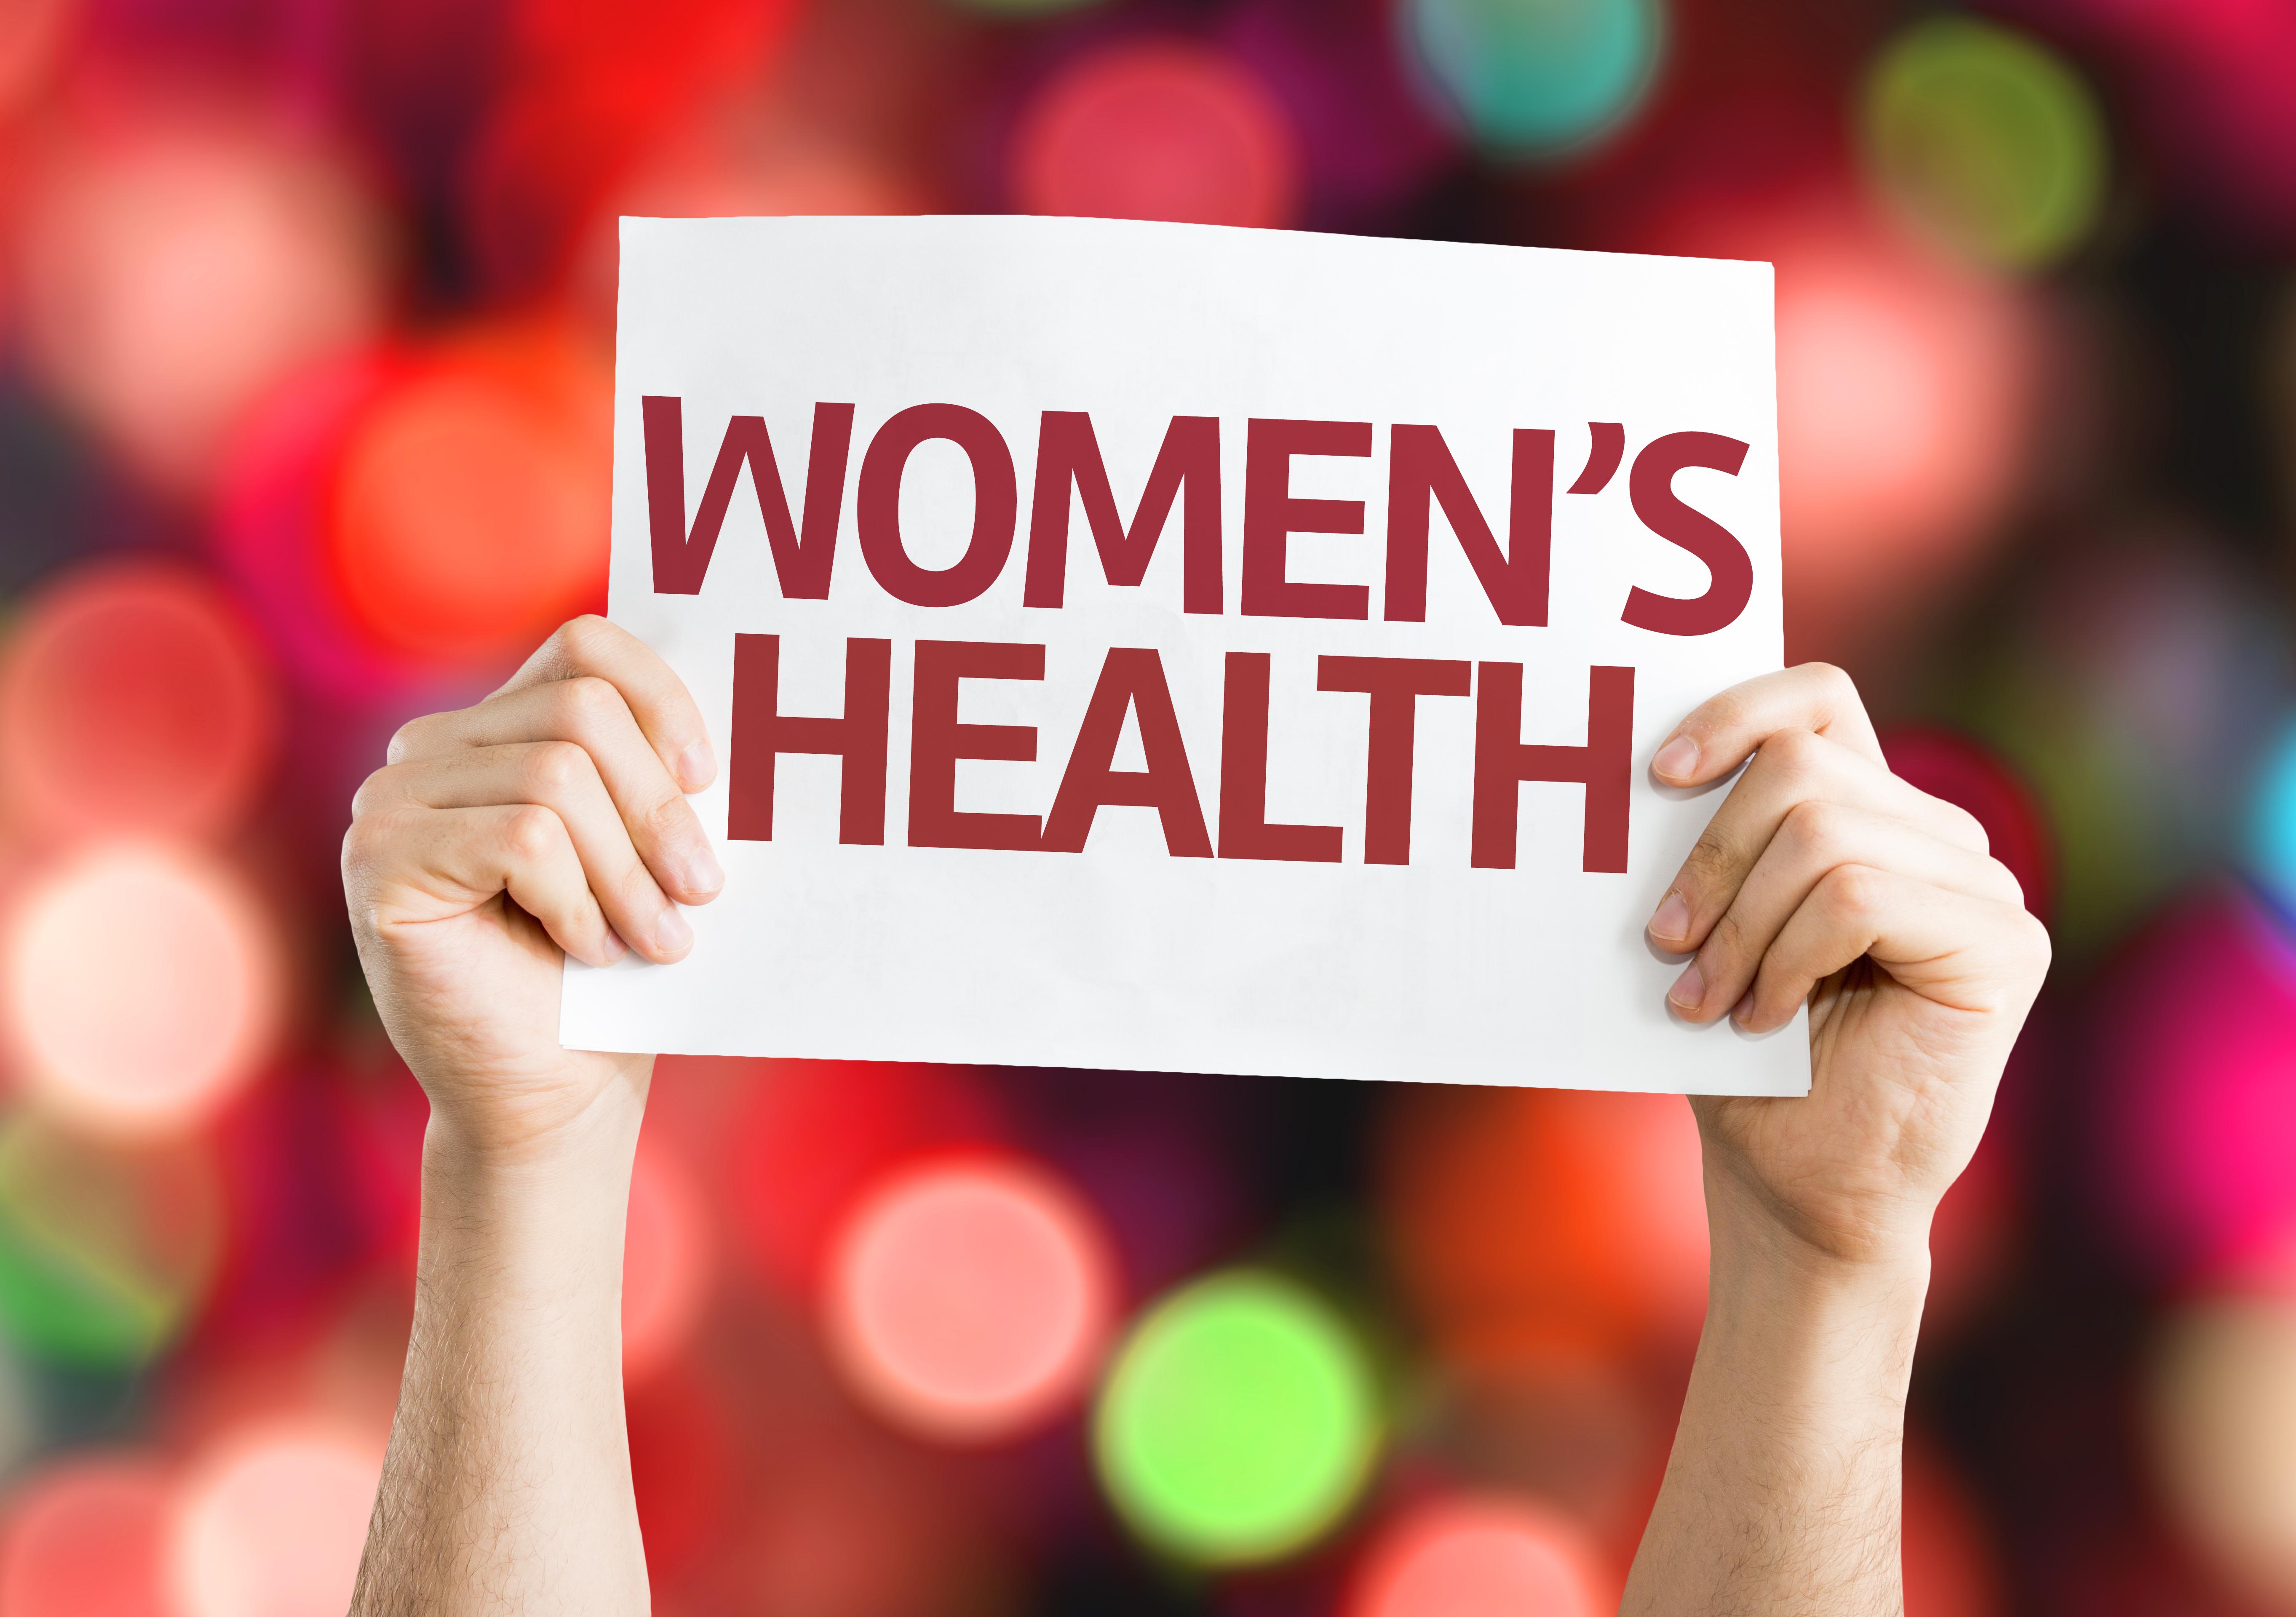 women's health sign